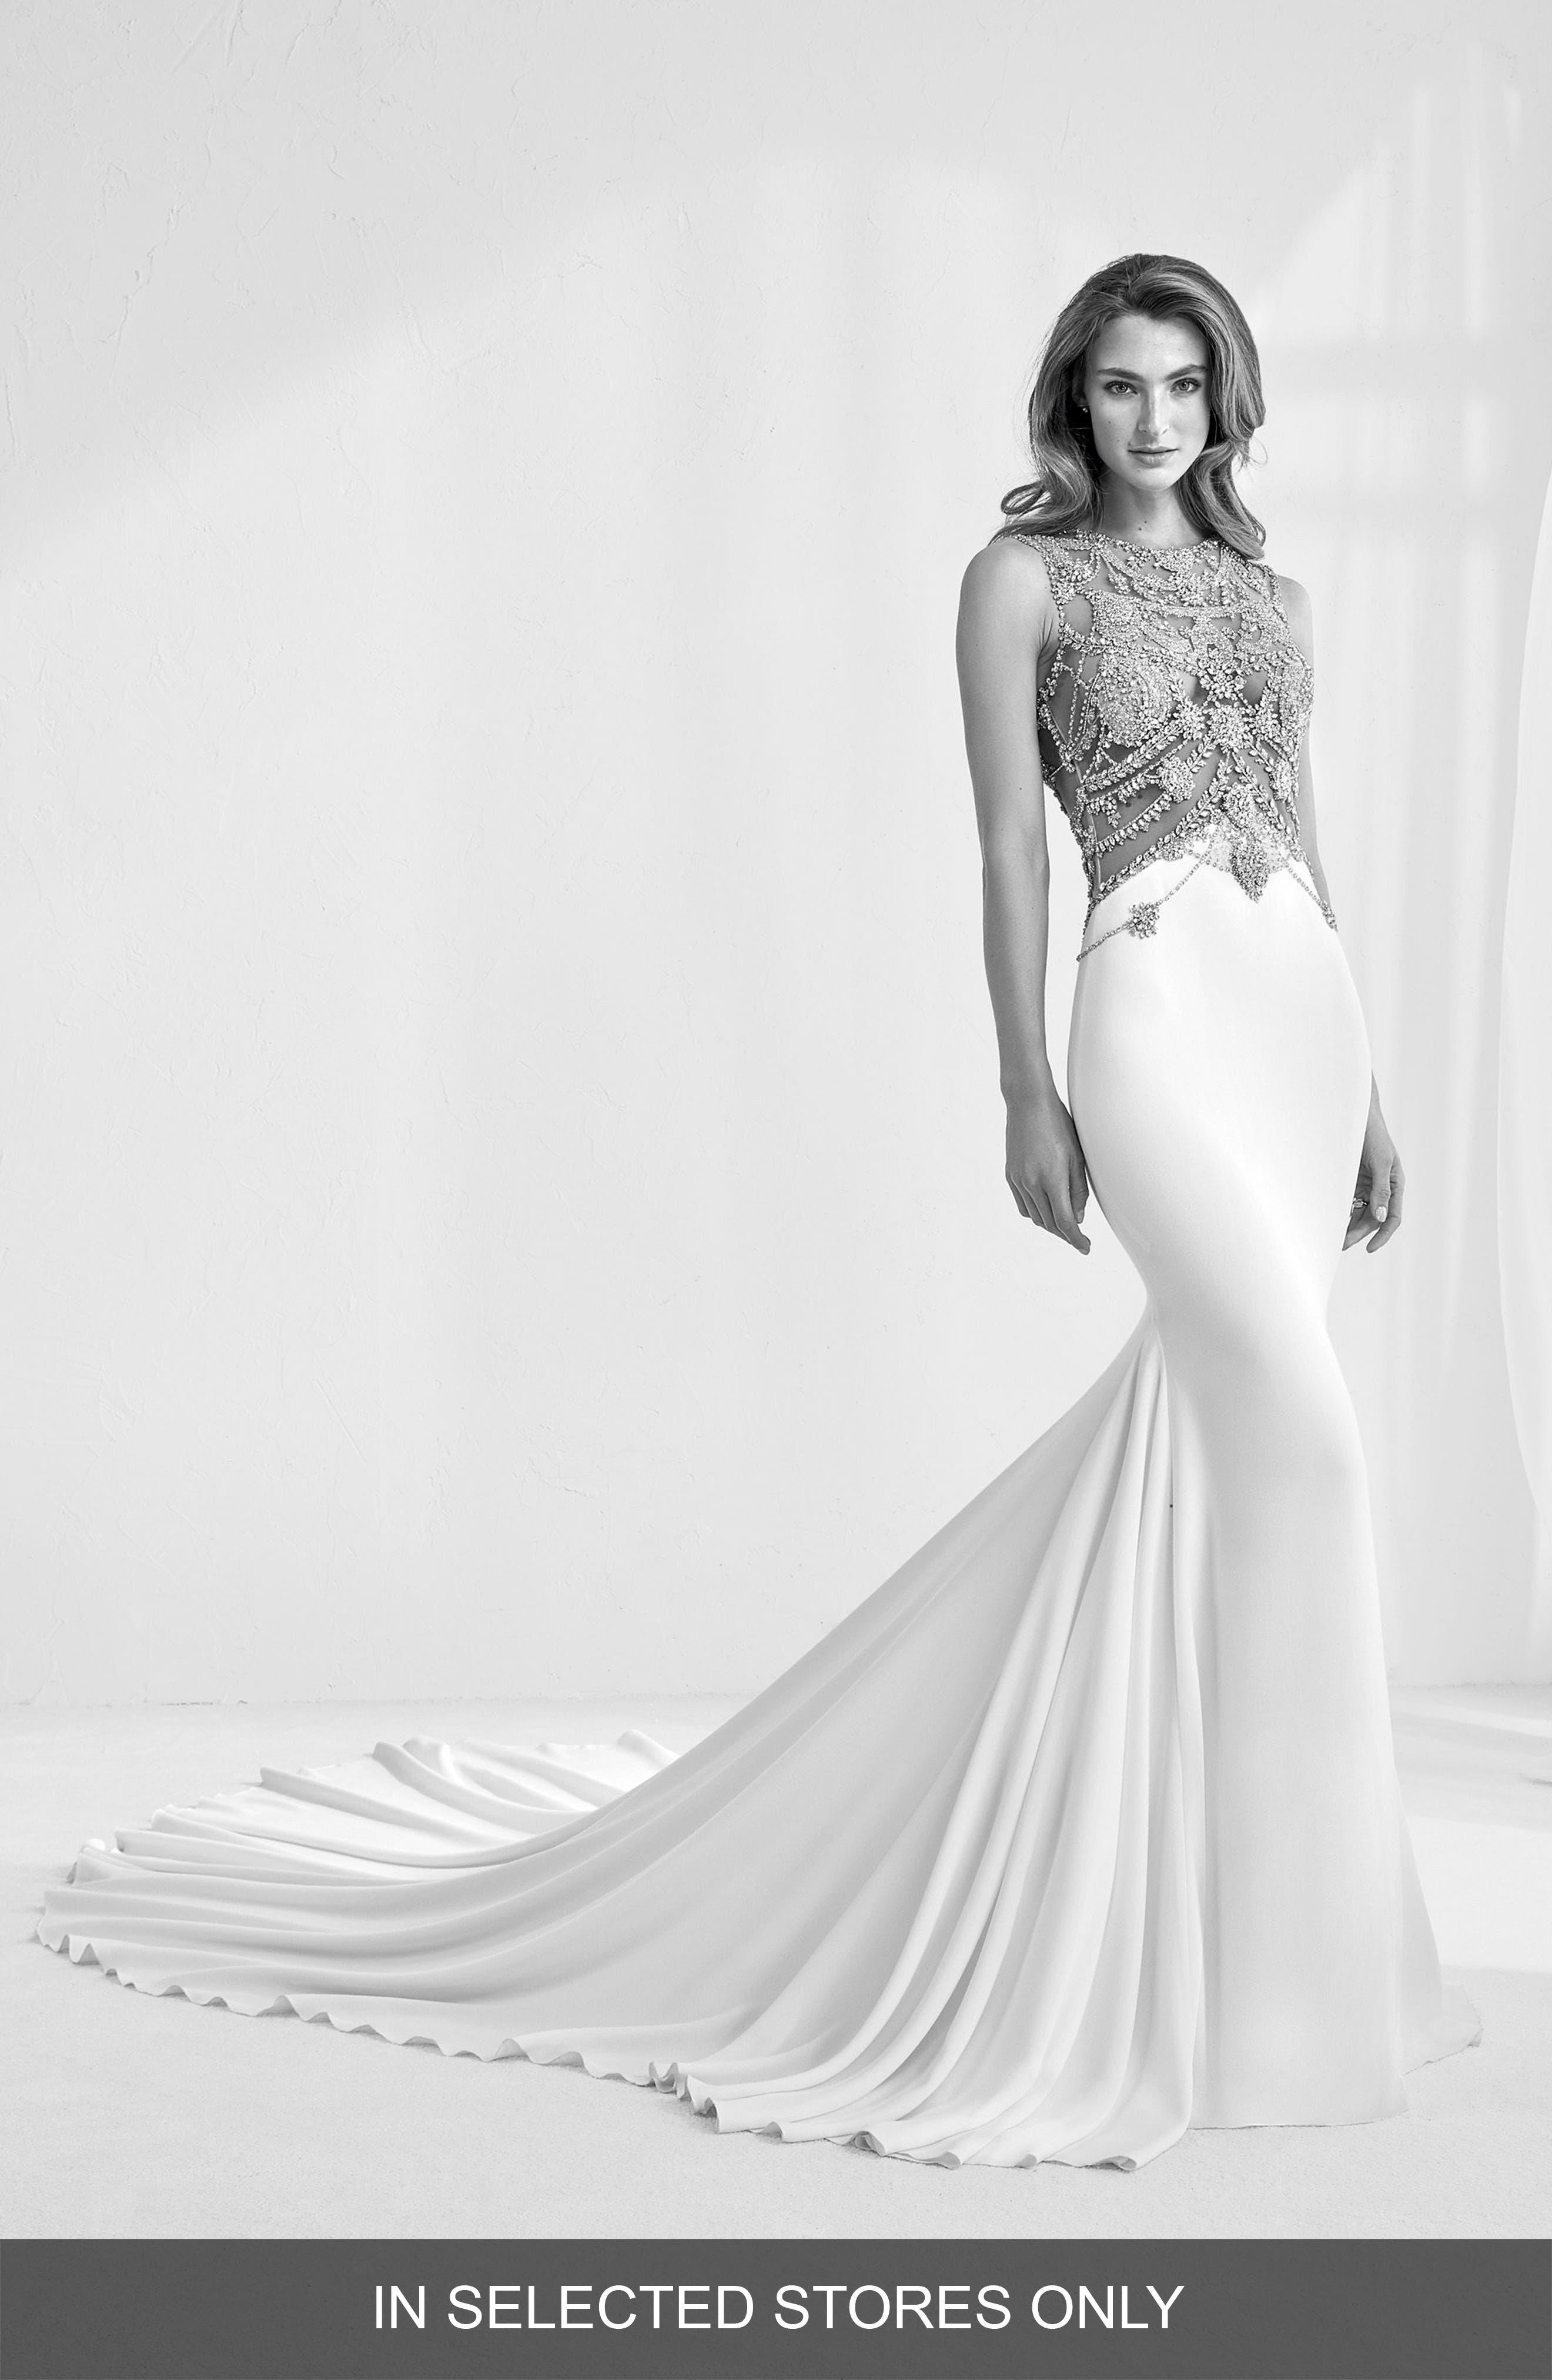 Alternate Image 1 Selected - Atelier Pronovias Ramir Jeweled Bodice Crepe Mermaid Gown